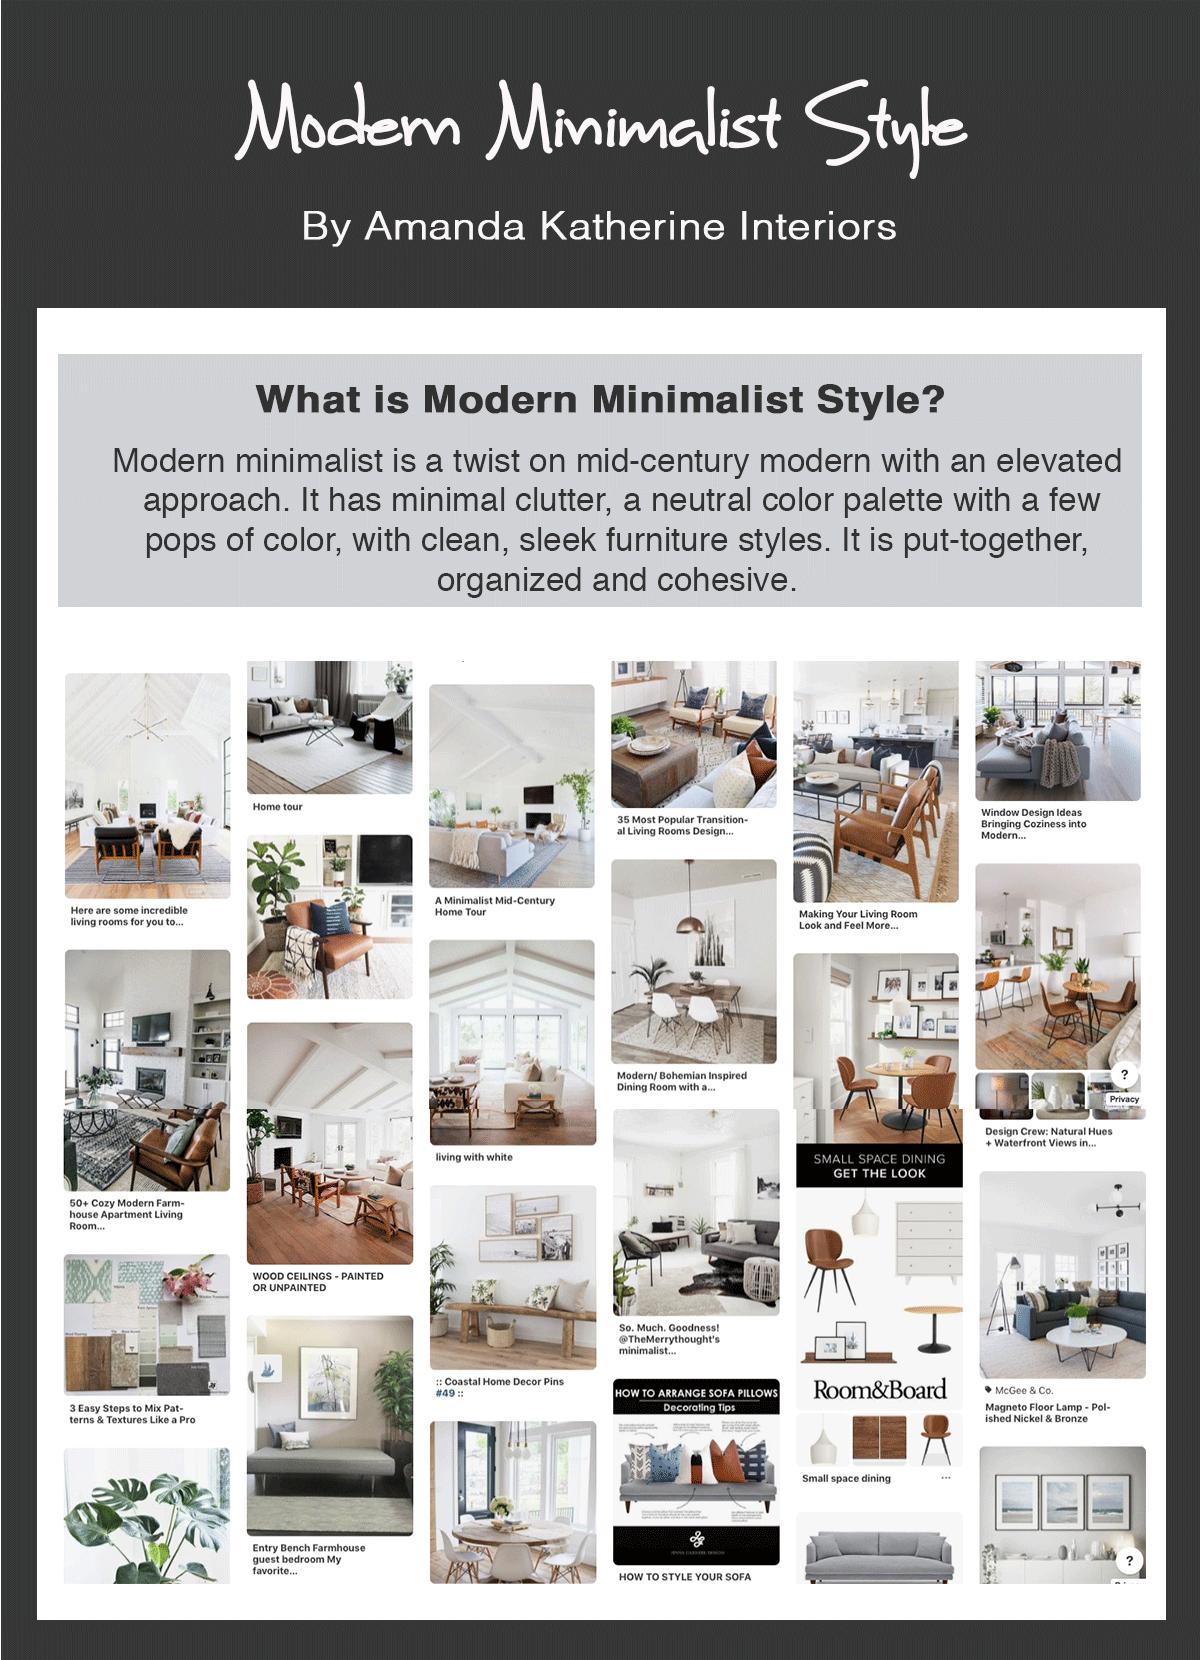 Modern-Minimalist-Style-Quiz-Report.png